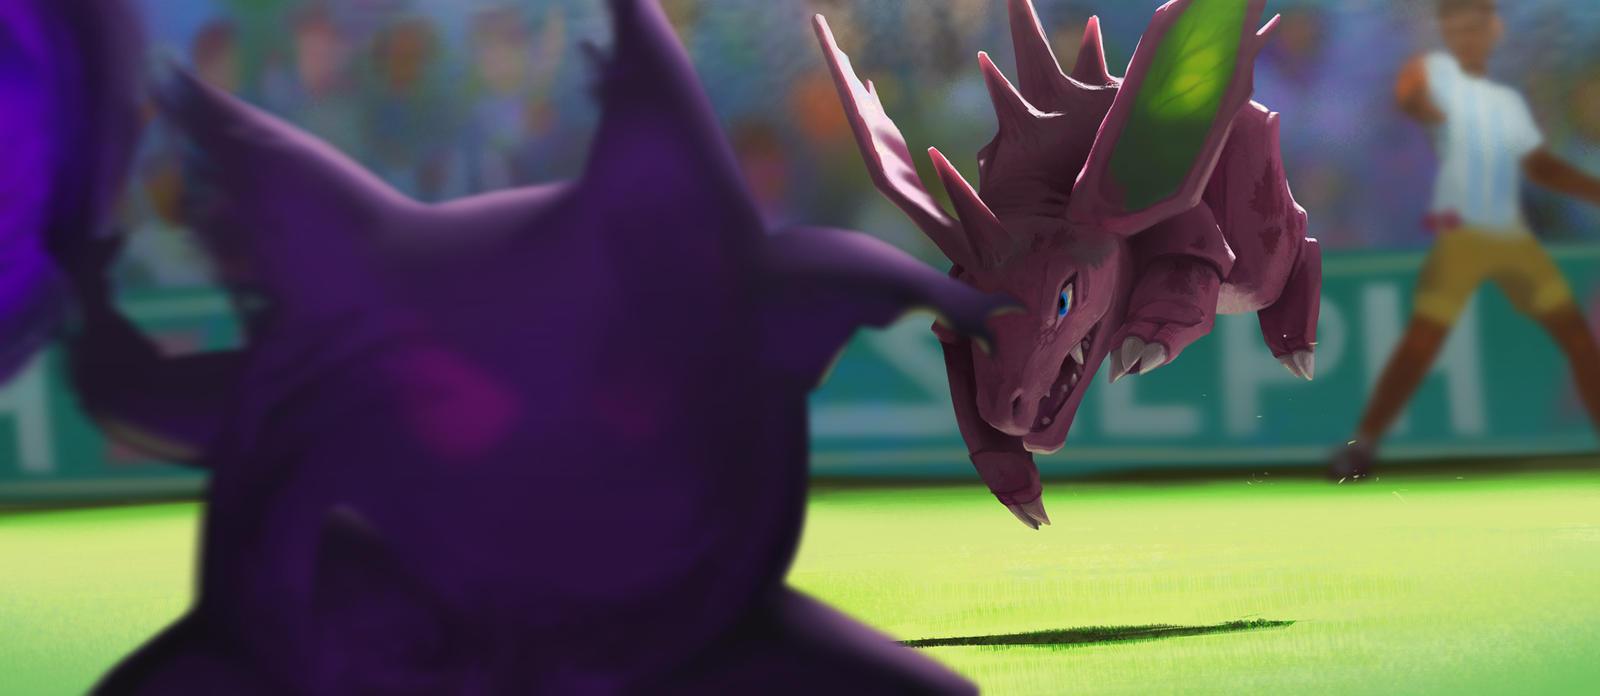 Pokemon by aocom on DeviantArt